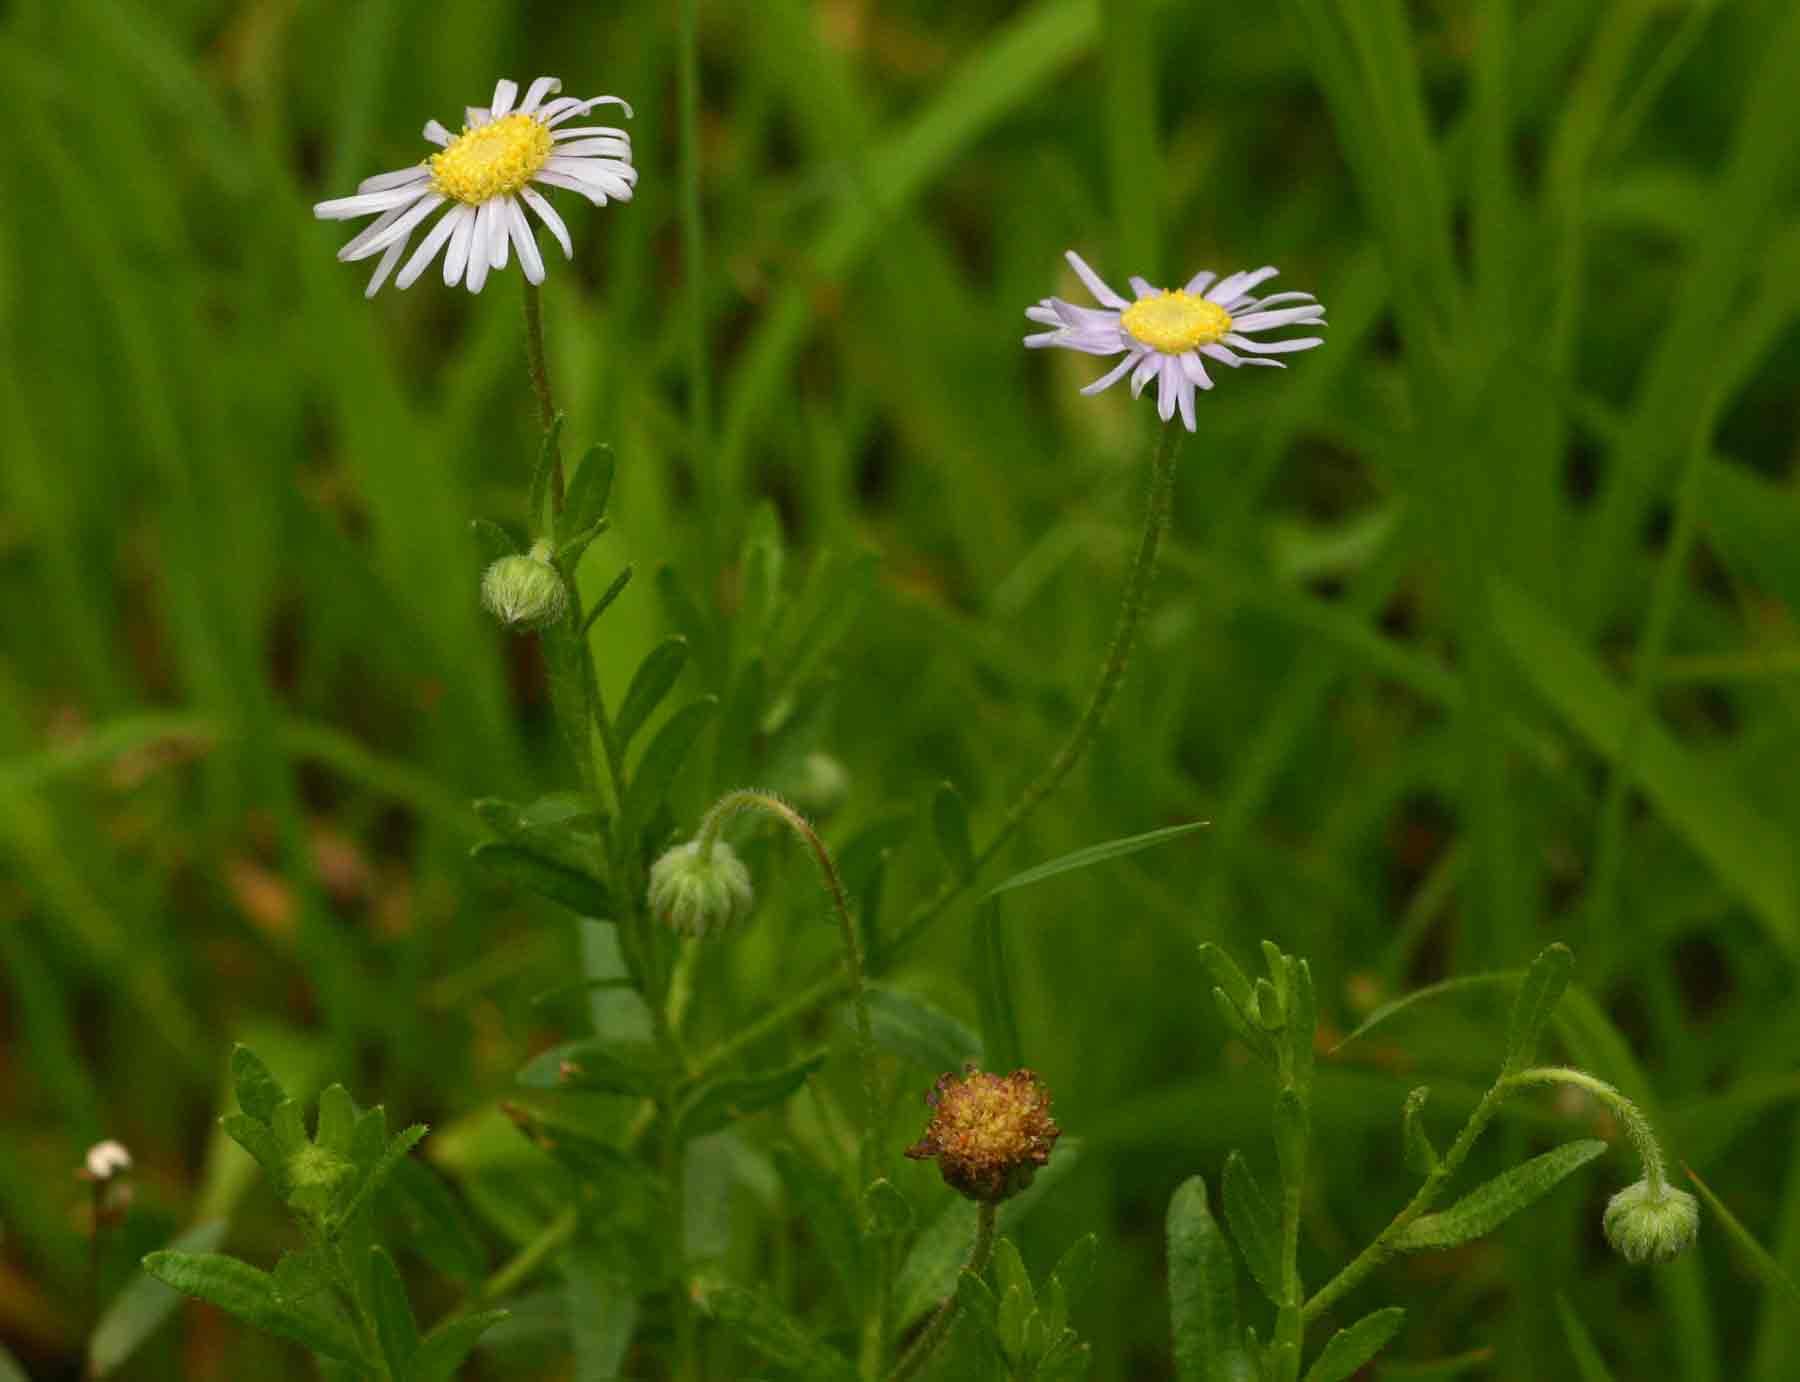 Felicia clavipilosa subsp. clavipilosa